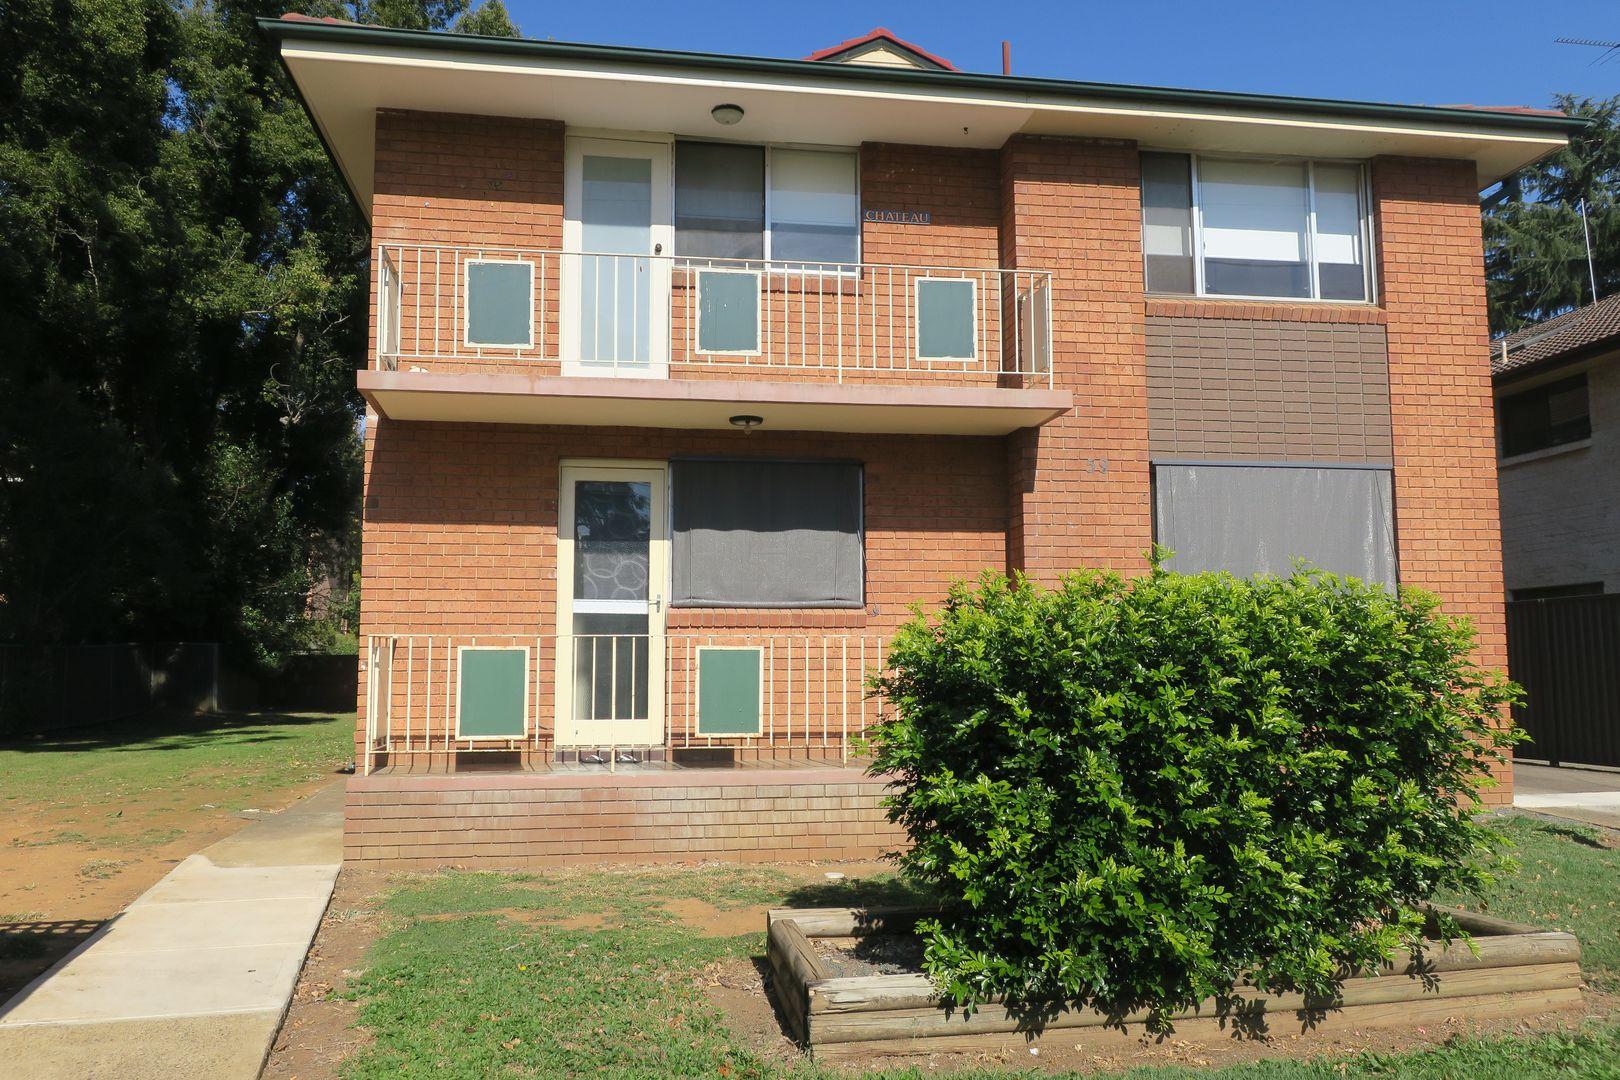 3/58 Putland  Street, St Marys NSW 2760, Image 0